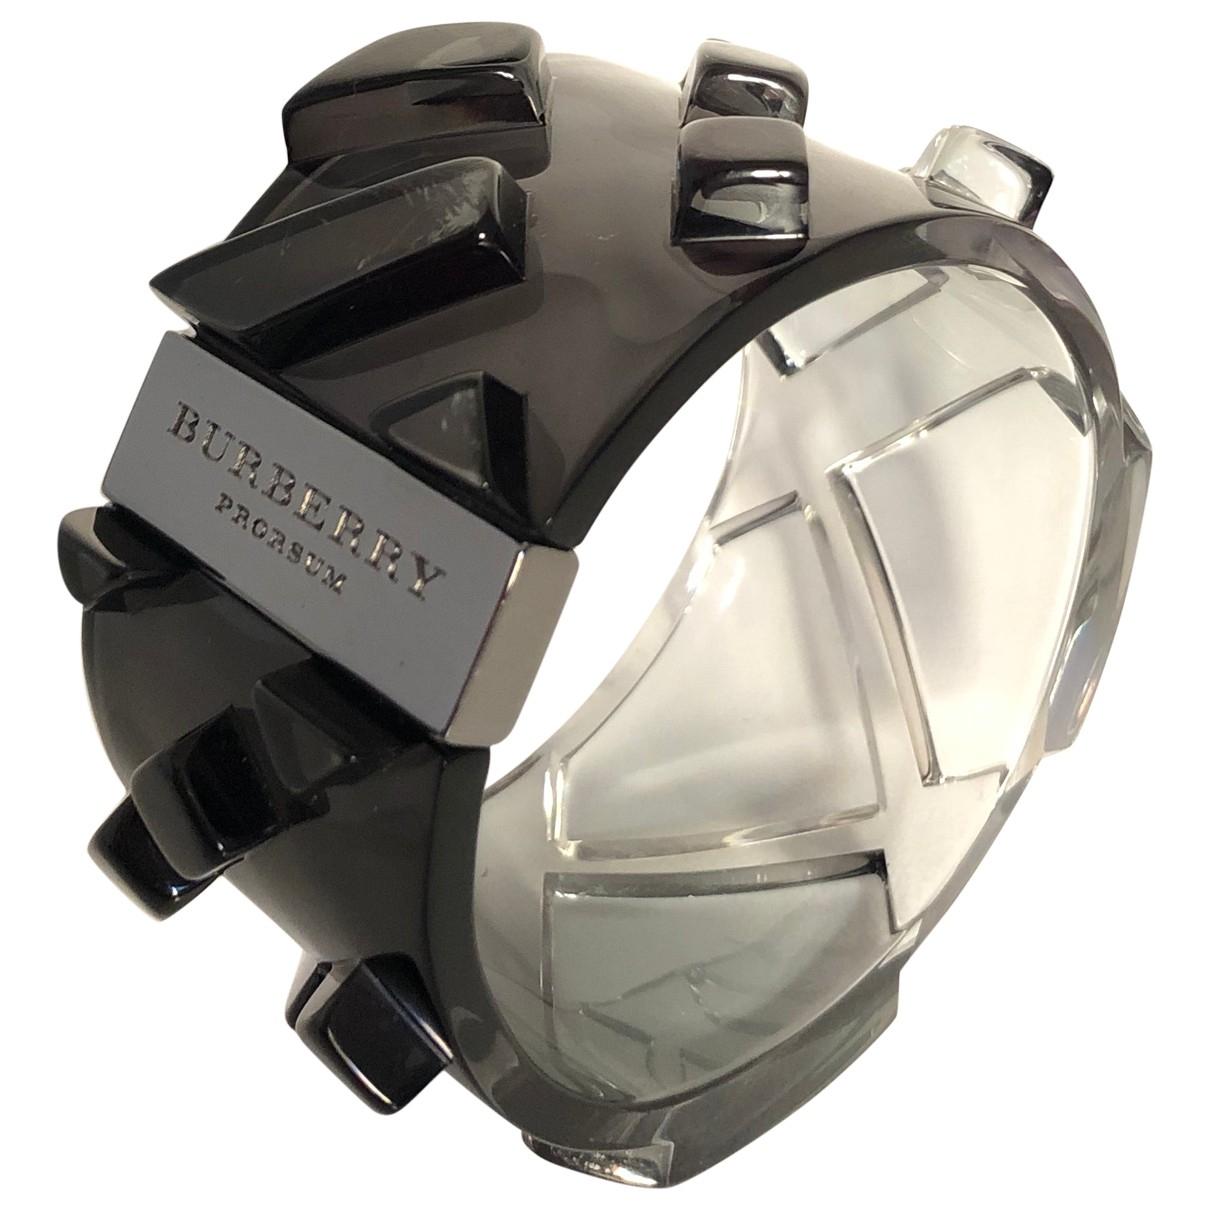 Burberry \N Armband in  Schwarz Kunststoff